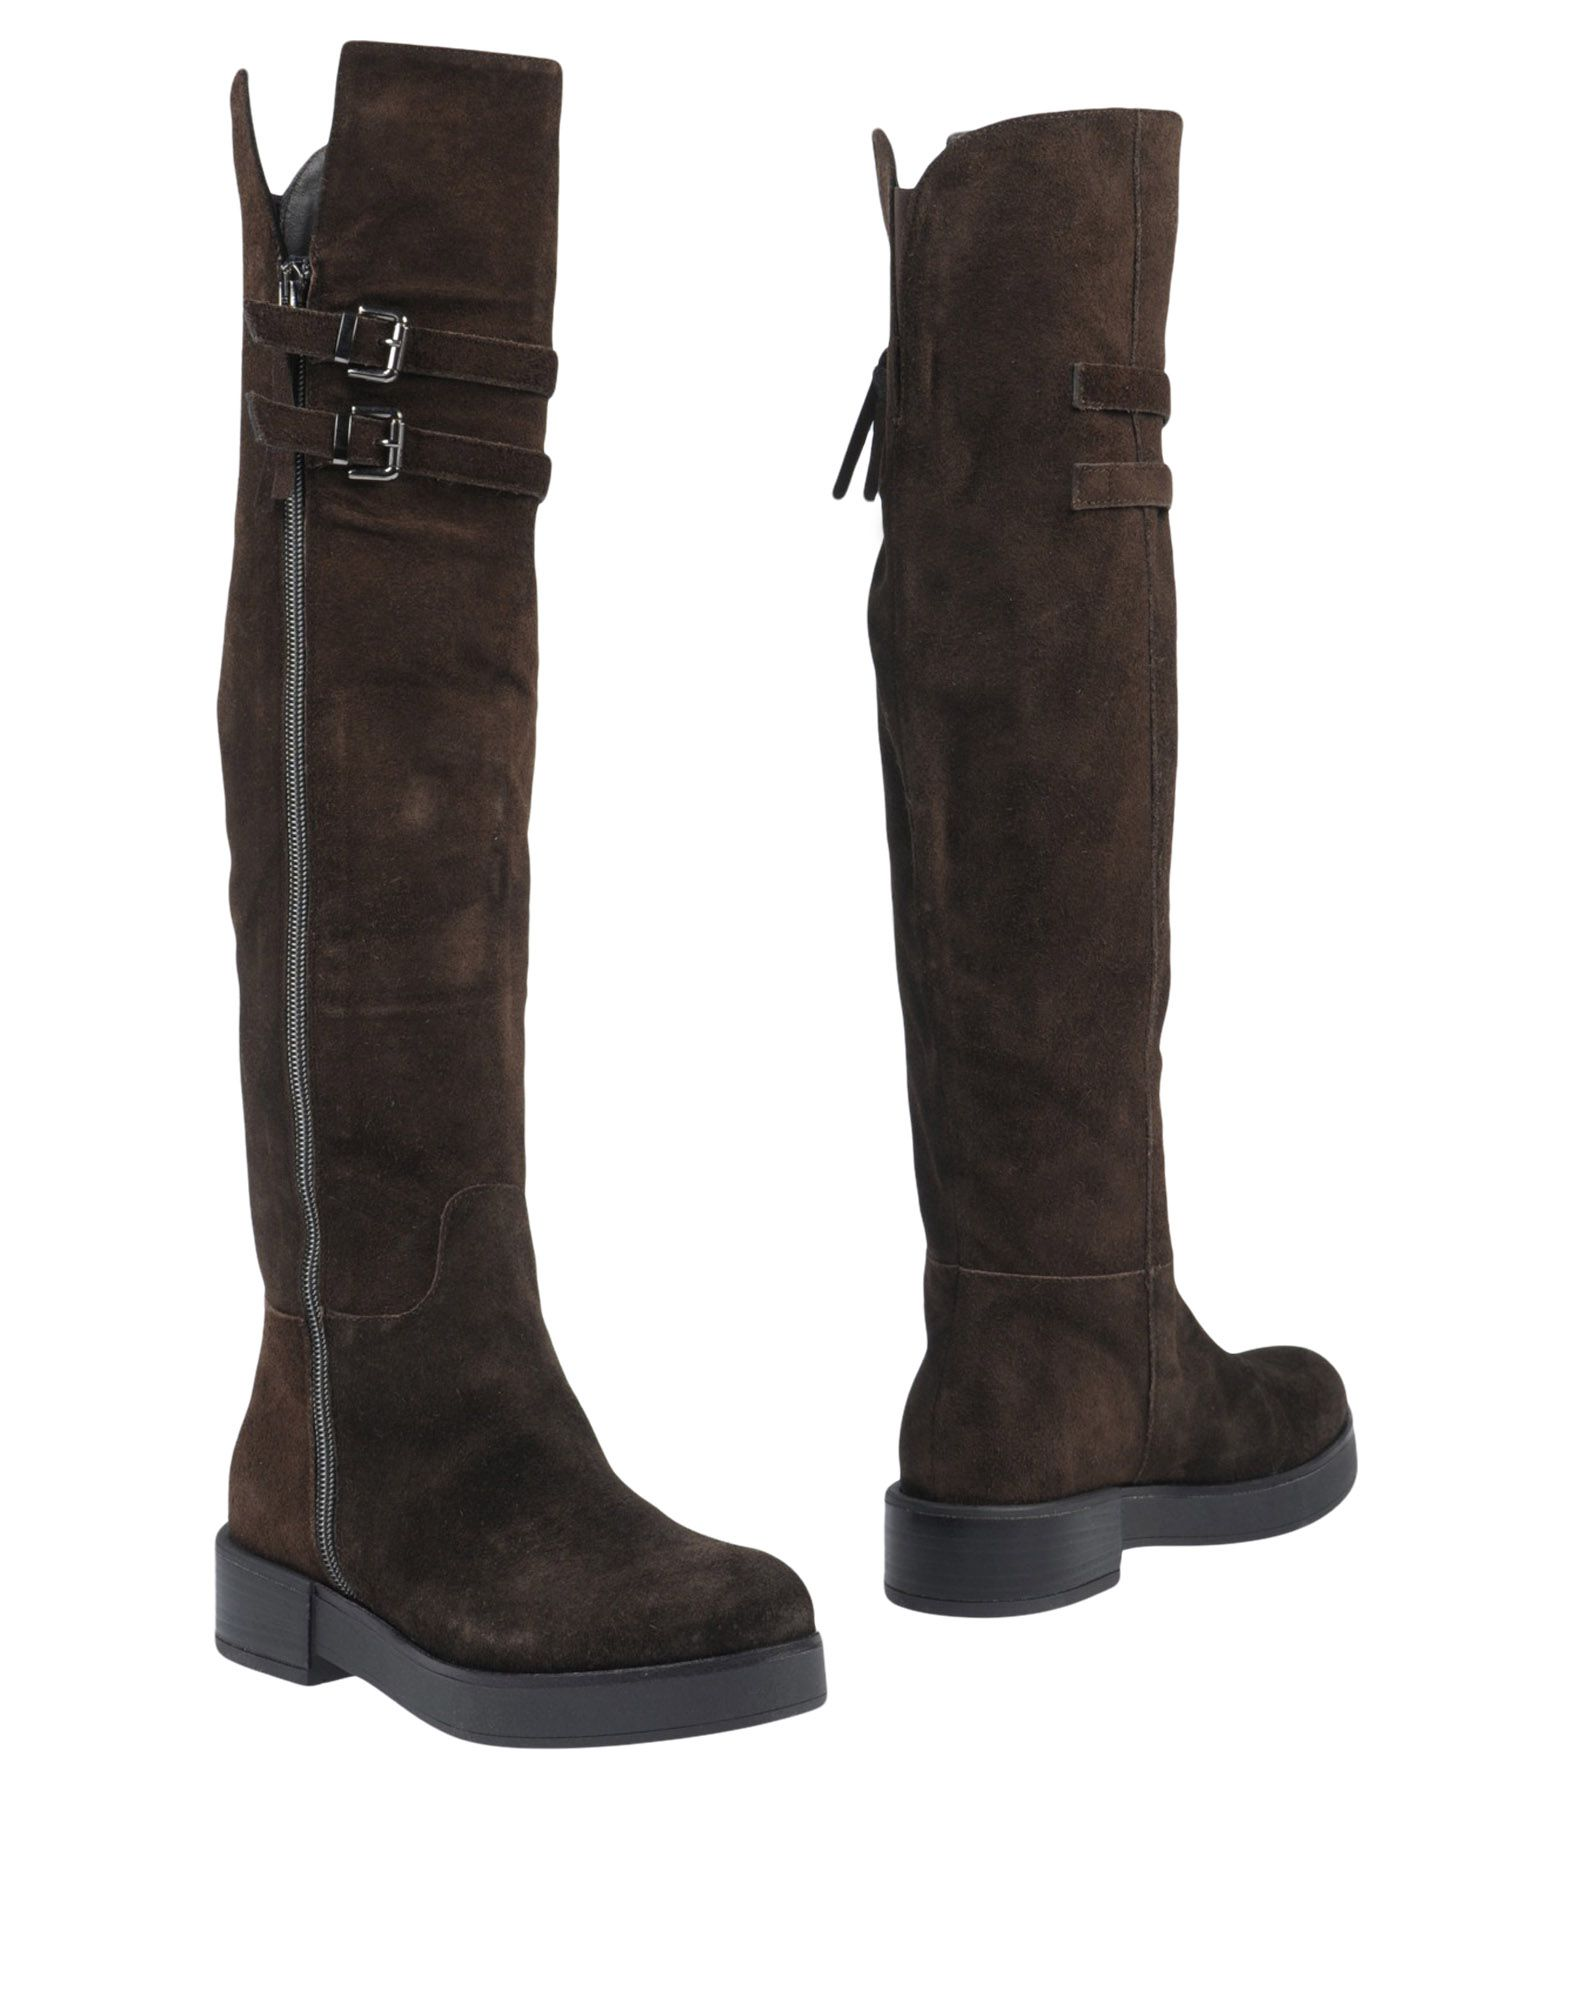 Emanuela Passeri Boots - Women Emanuela Passeri Canada Boots online on  Canada Passeri - 11444459UB d06477